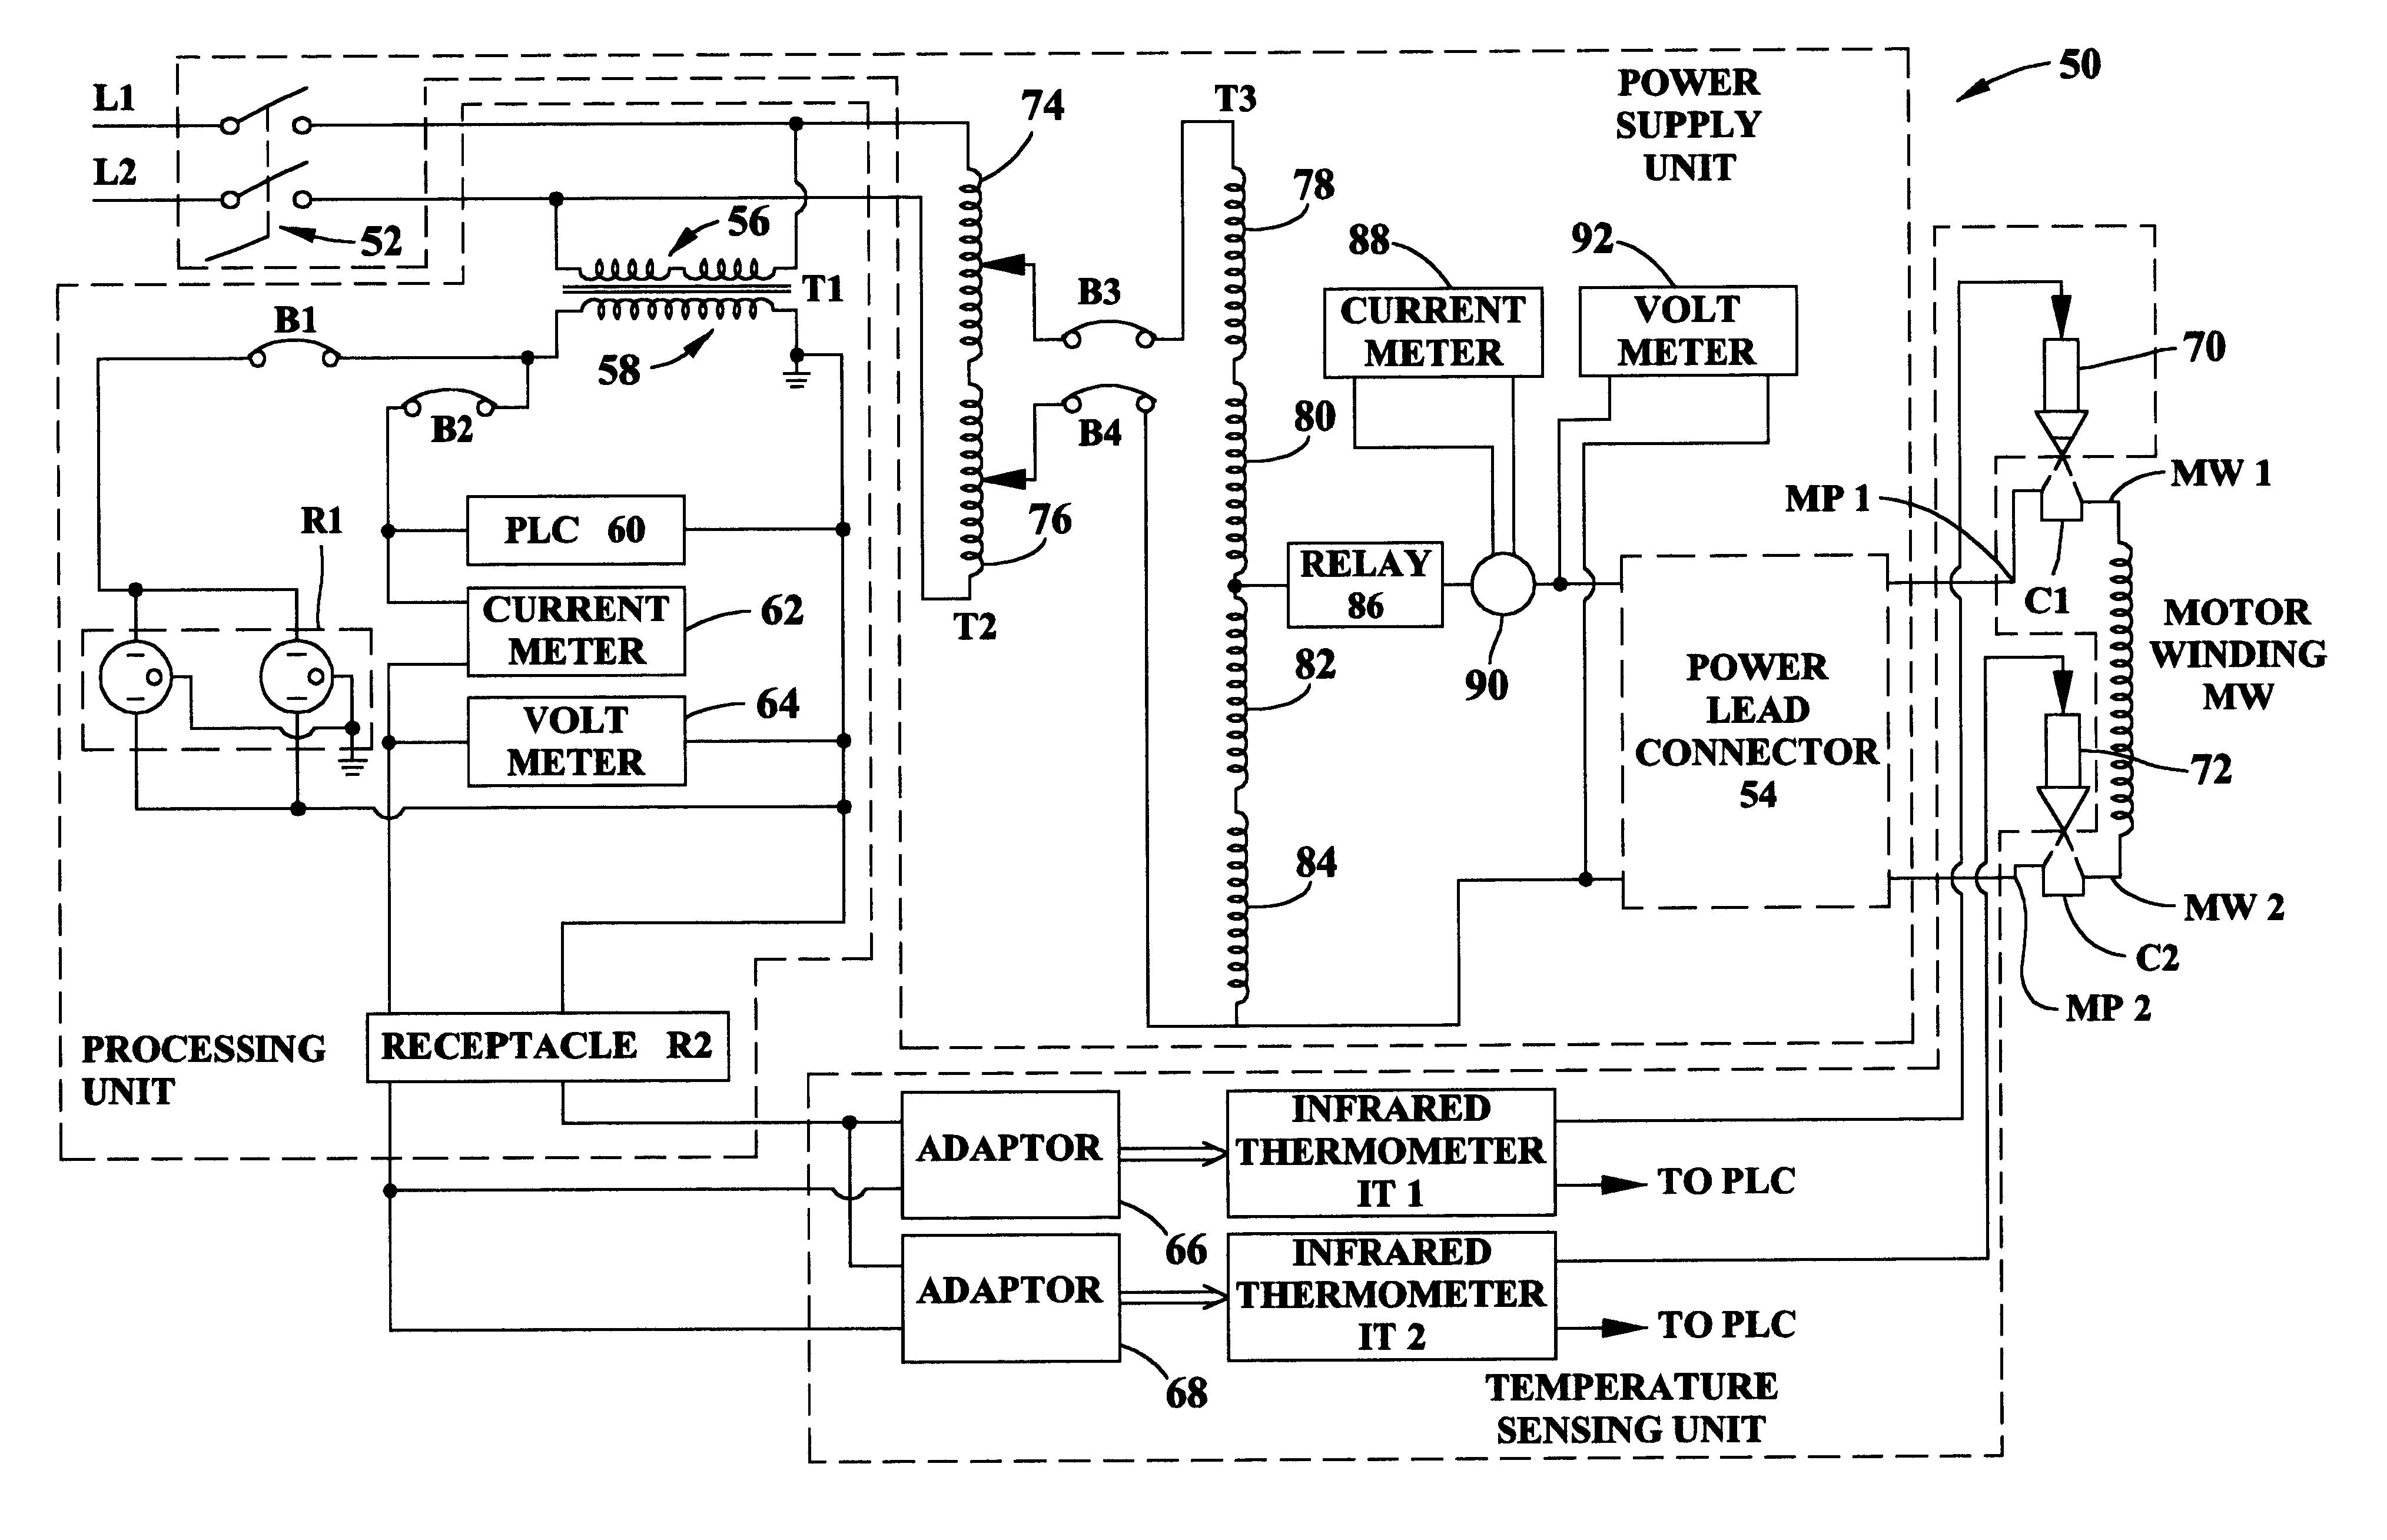 New Age Generator Wiring Diagram For - 2005 300c Rear Fuse Box Diagram for Wiring  Diagram SchematicsWiring Diagram Schematics